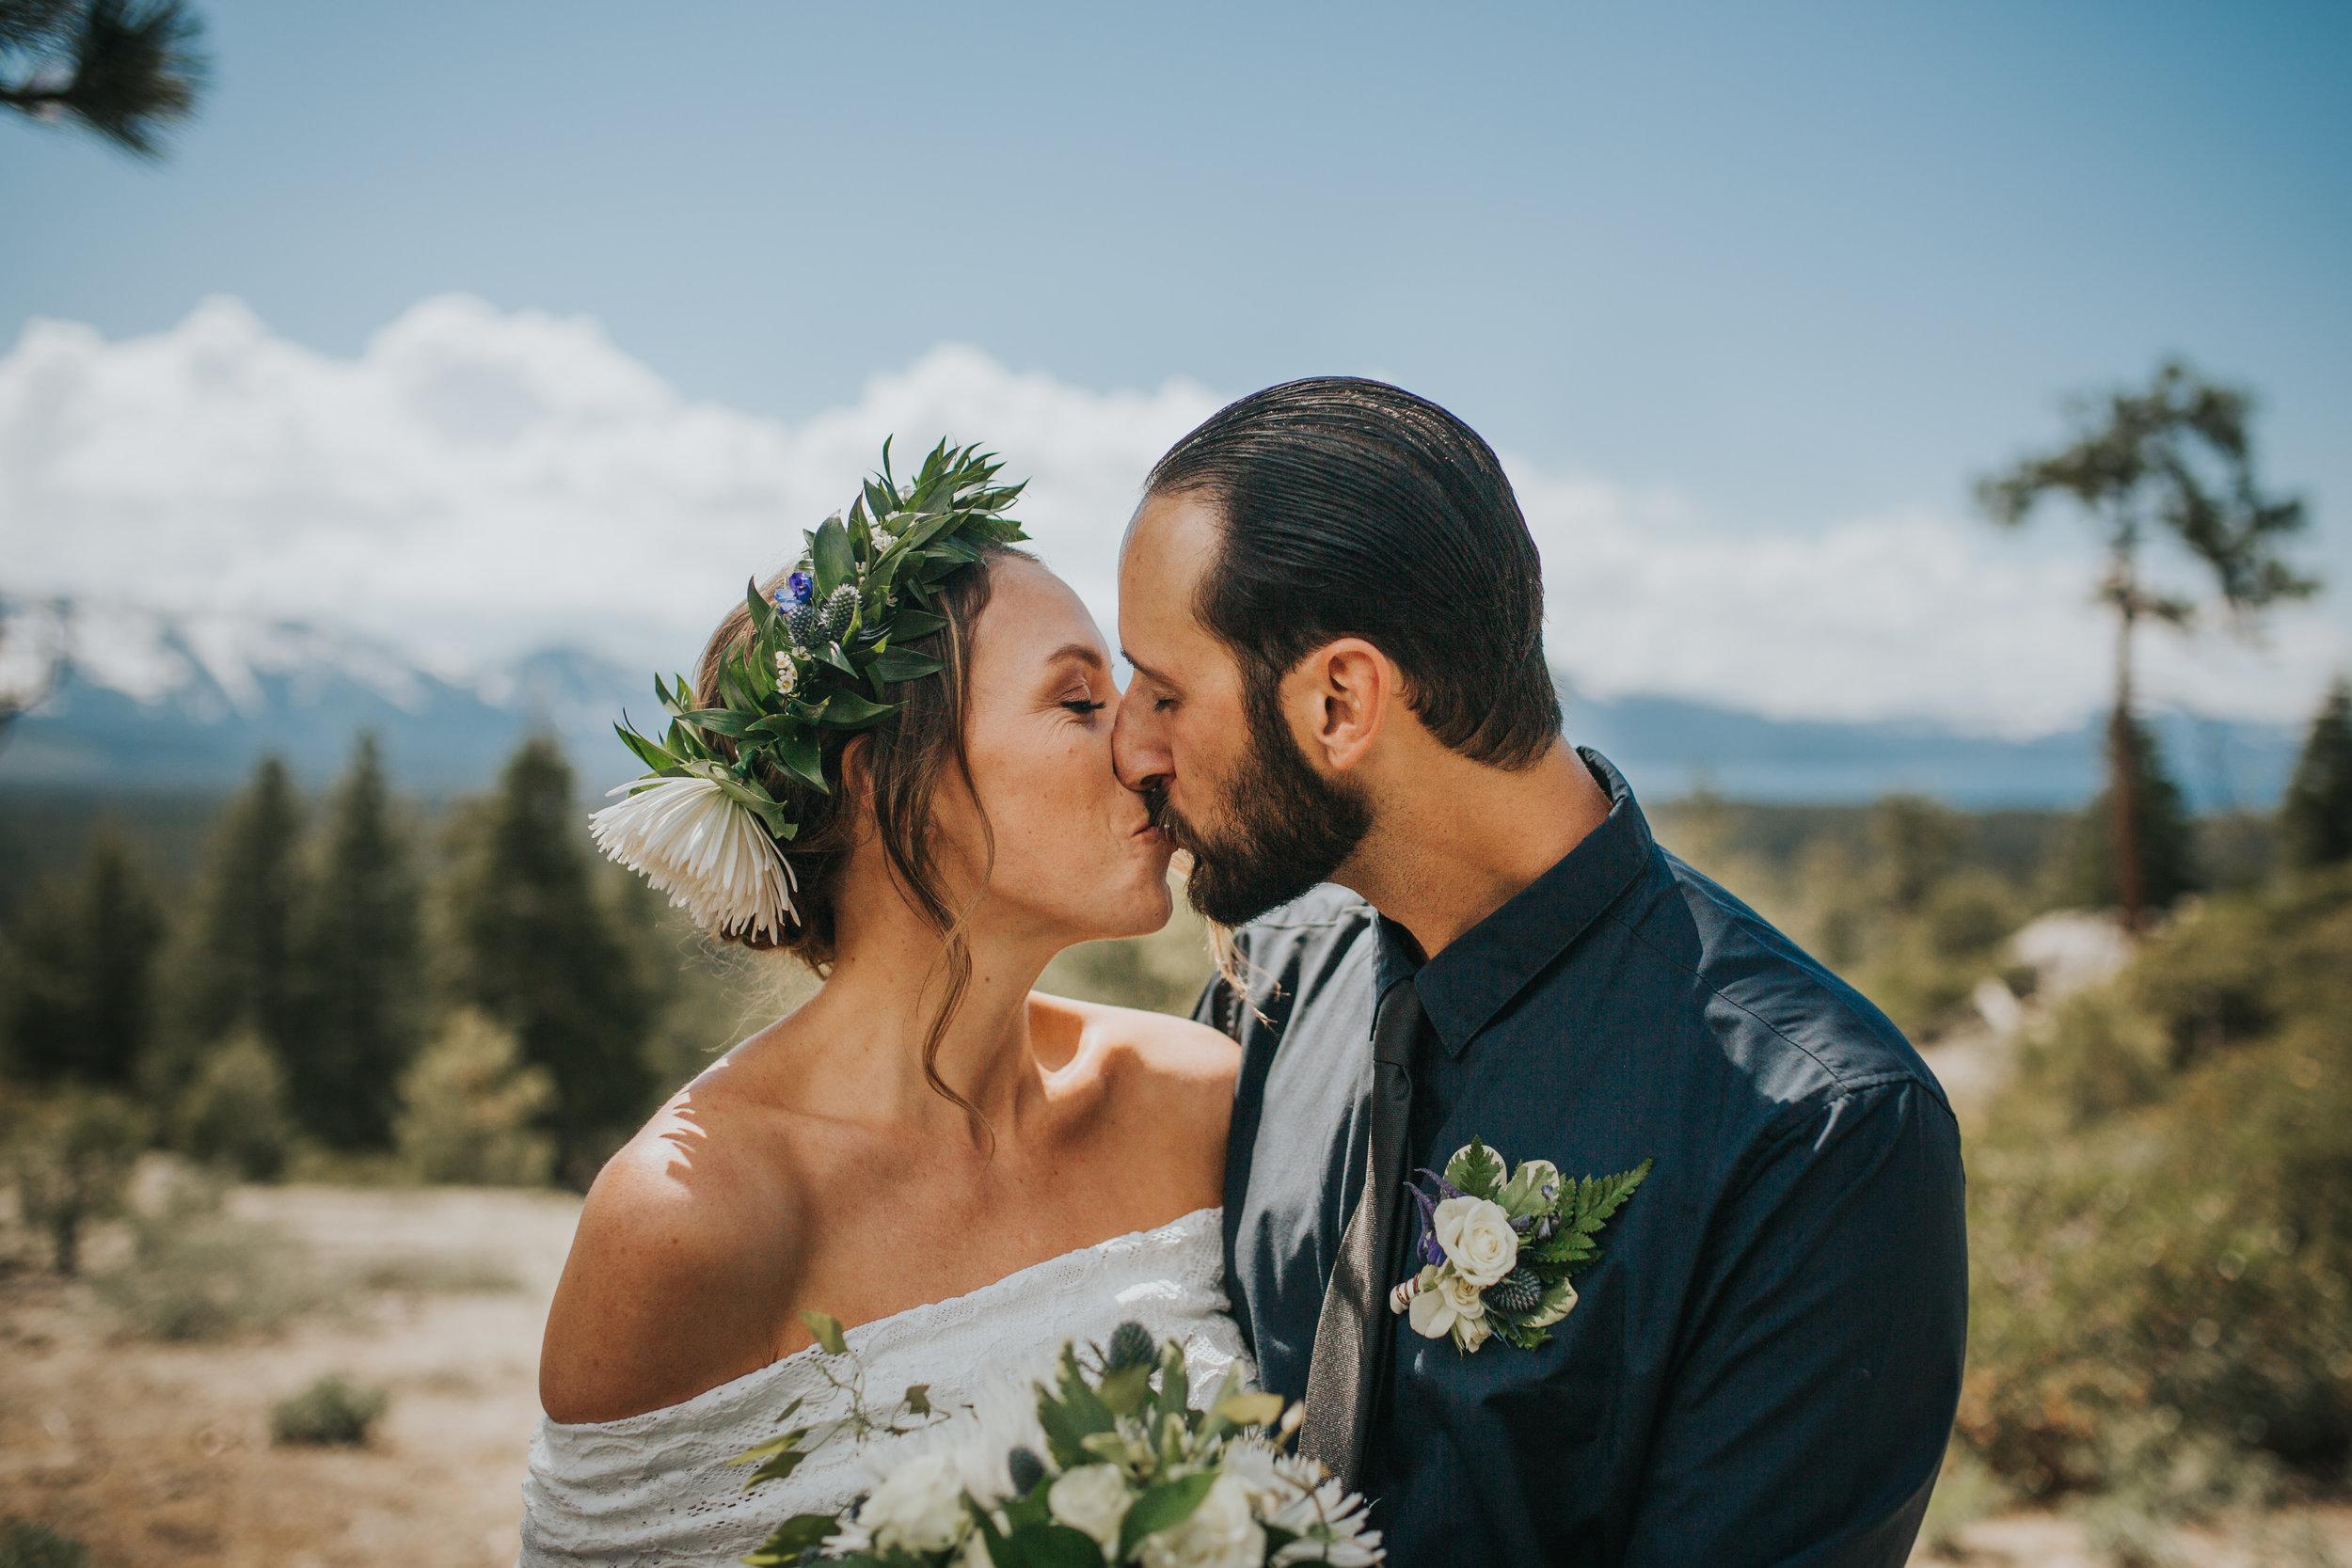 south-lake-tahoe-elopement-valerie-lendvay-photo-036.jpg